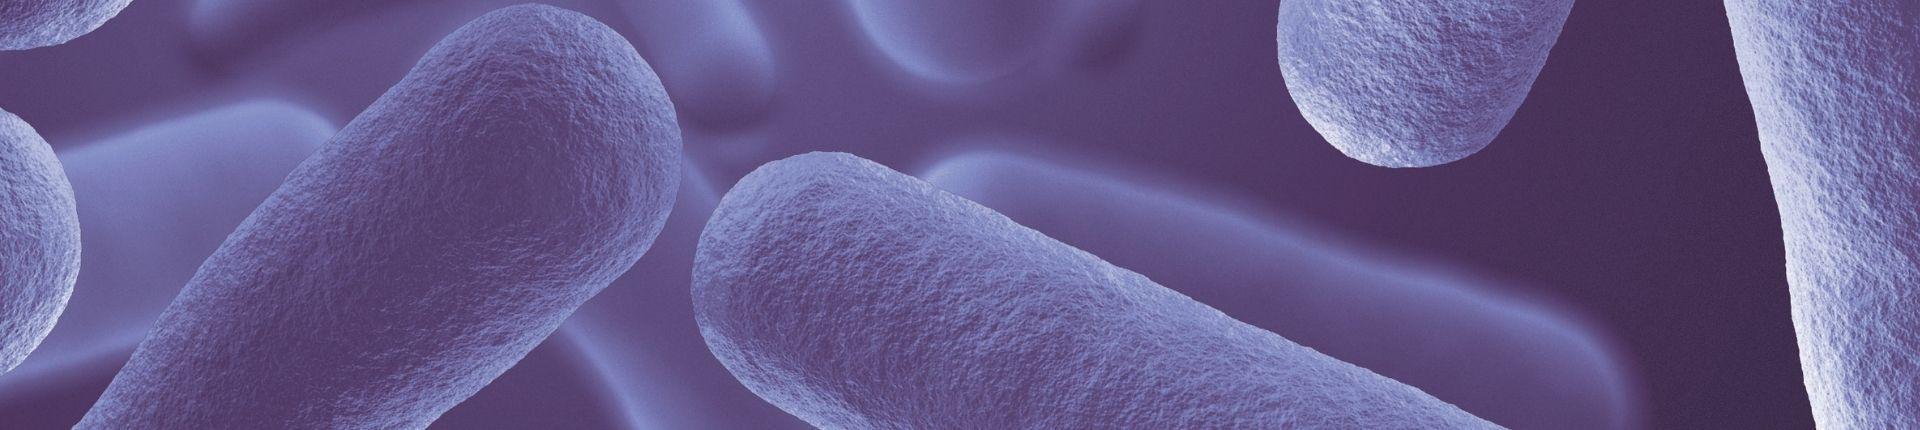 image microbiote